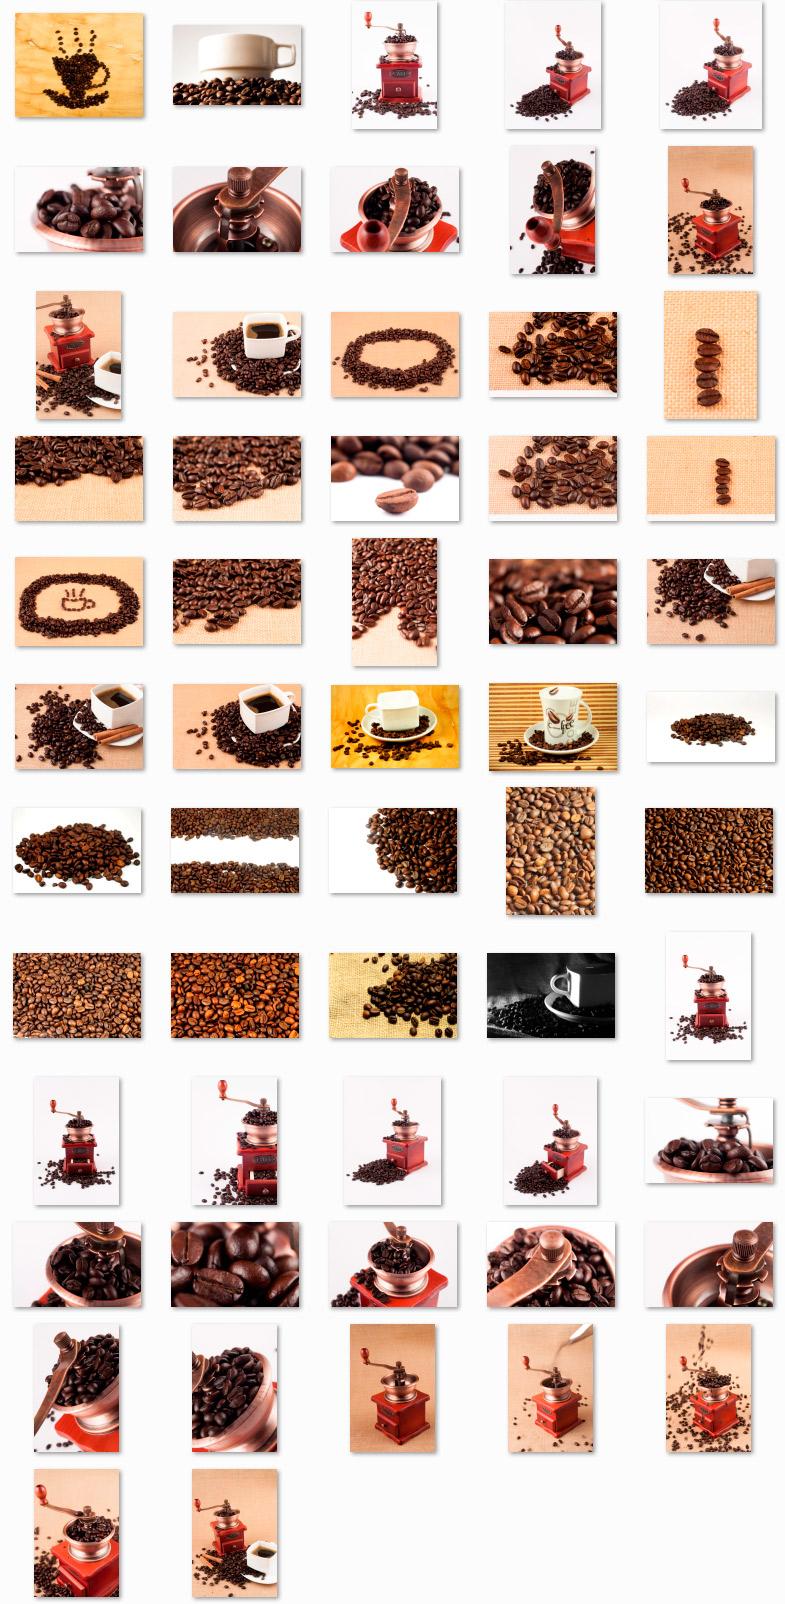 high quality stock photos - coffe-imagine